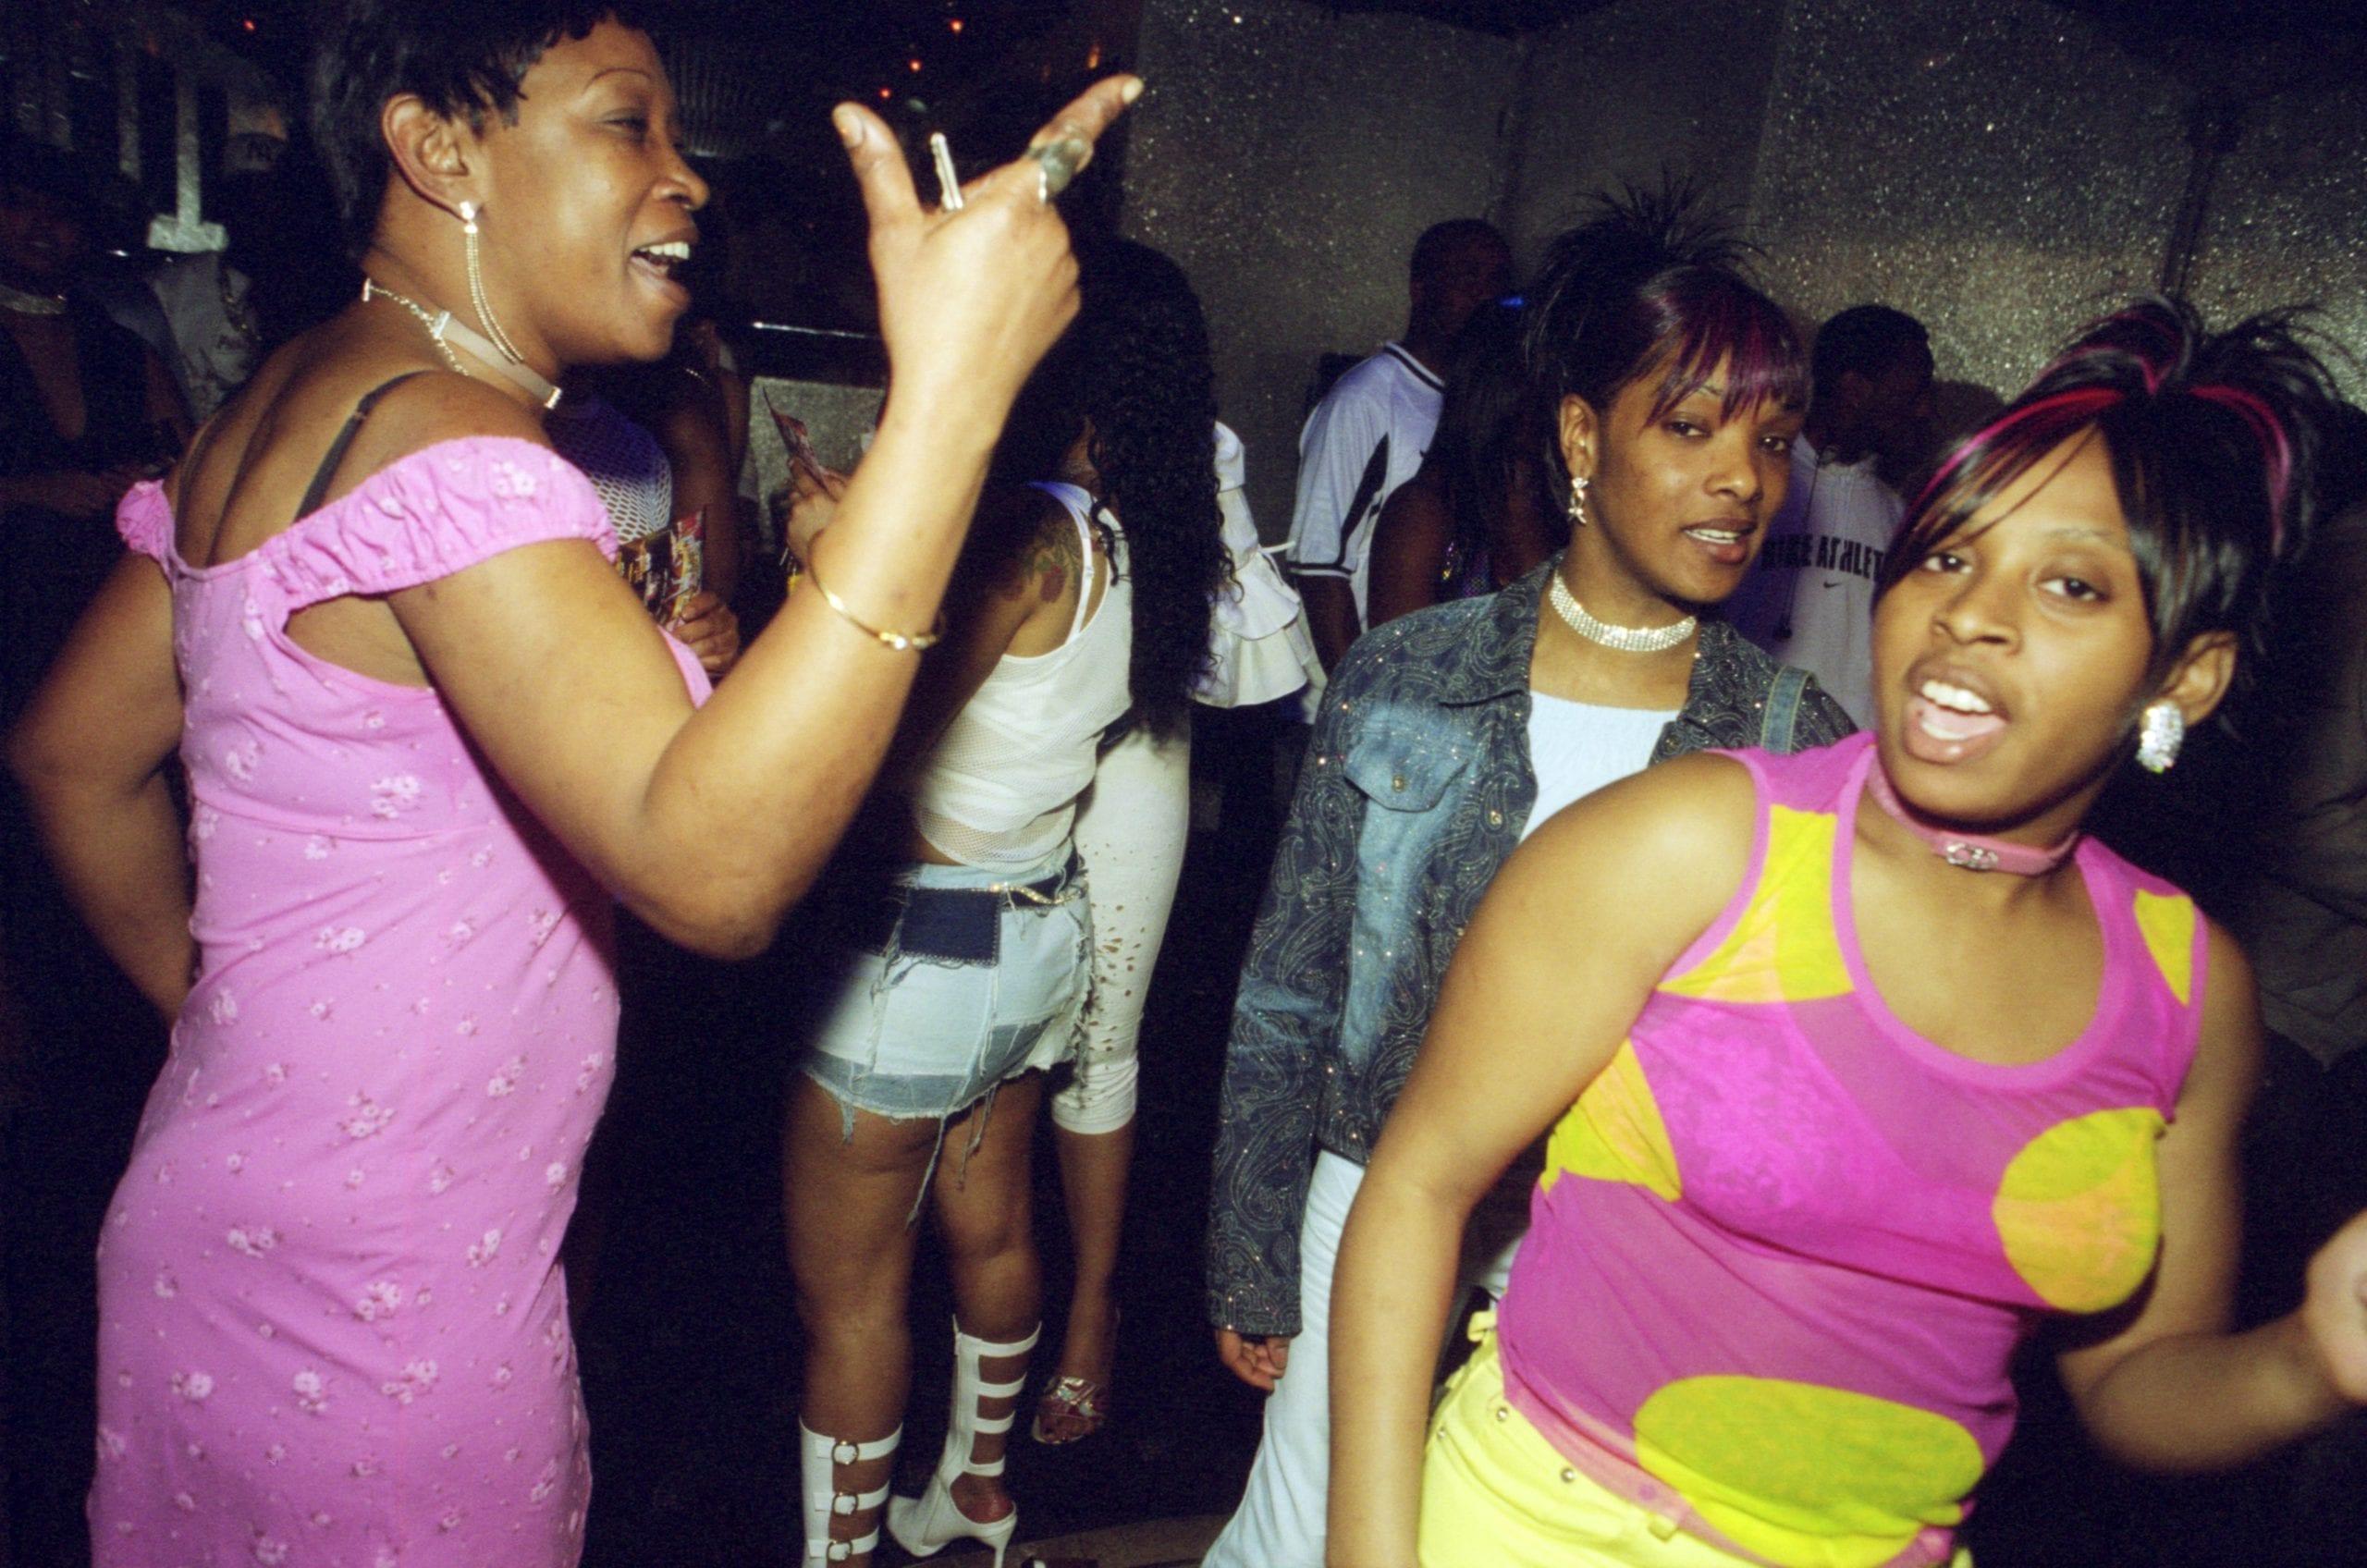 Cameos Nightclub, Peckham, 2003 © David Titlow